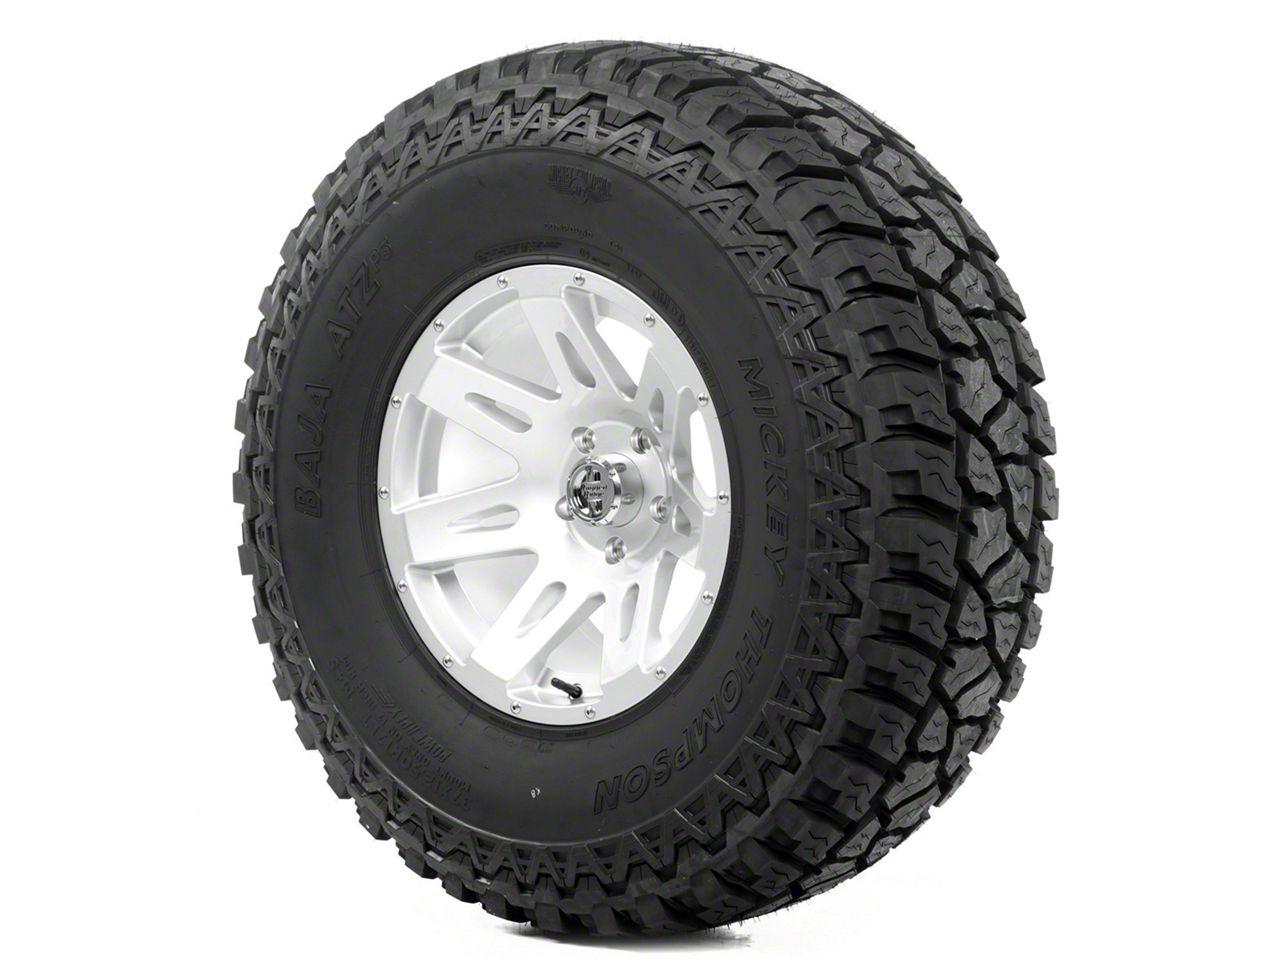 Rugged Ridge XHD Wheel 17x9 Silver and Mickey Thompson ATZ P3 37x12.50x17 Tire Kit (13-18 Jeep Wrangler JK; 2018 Jeep Wrangler JL)